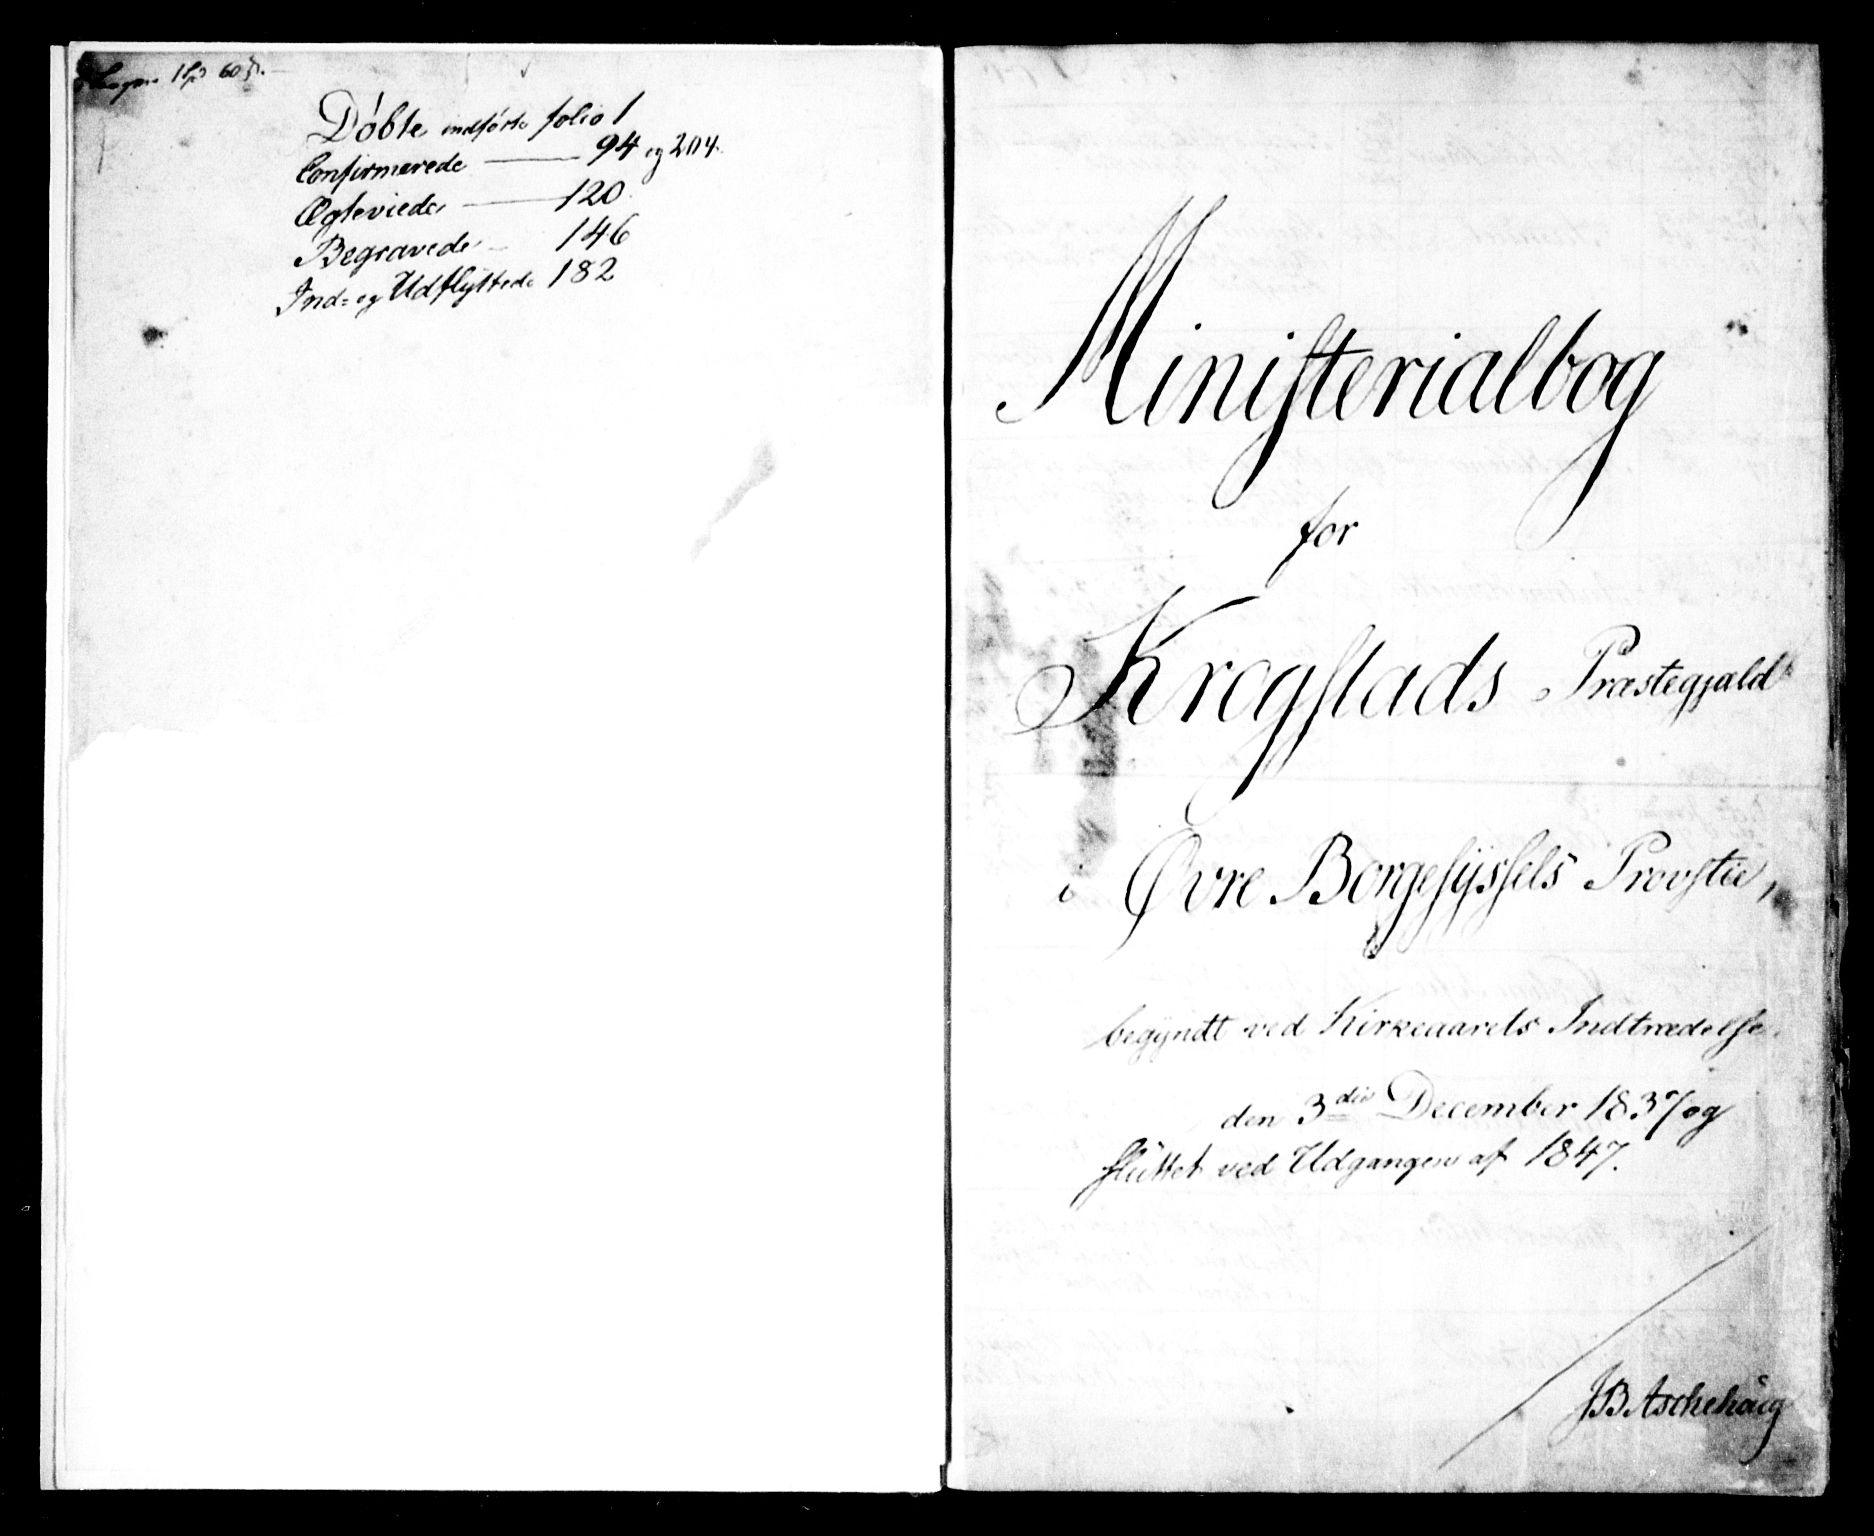 SAO, Kråkstad prestekontor Kirkebøker, F/Fa/L0005: Ministerialbok nr. I 5, 1837-1847